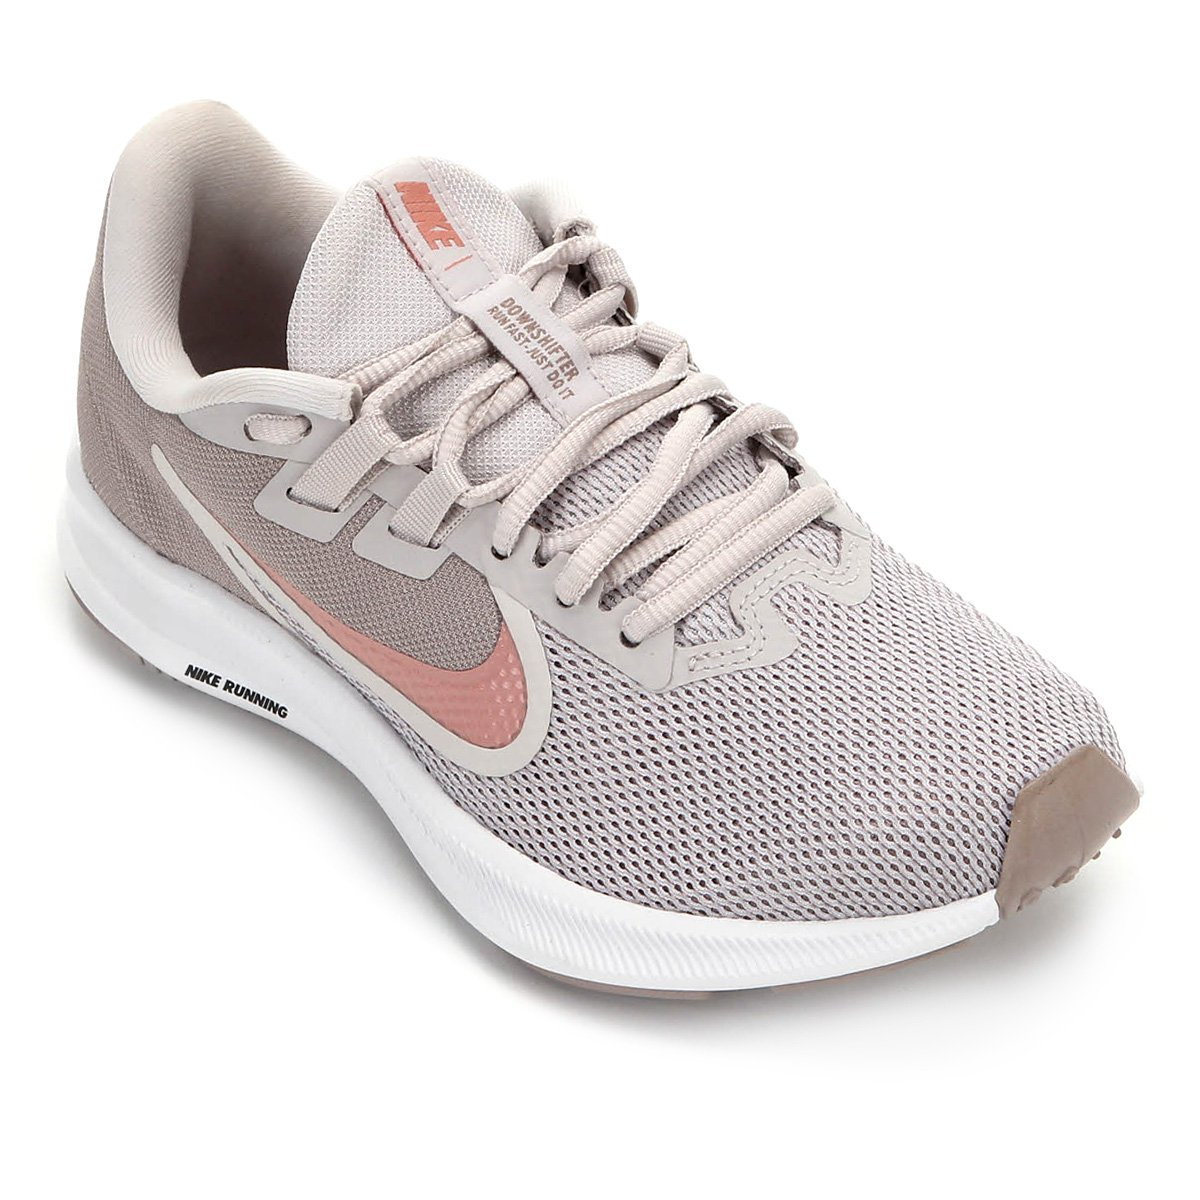 Tênis Nike Downshifter 9 Feminino Cinza E Rosa